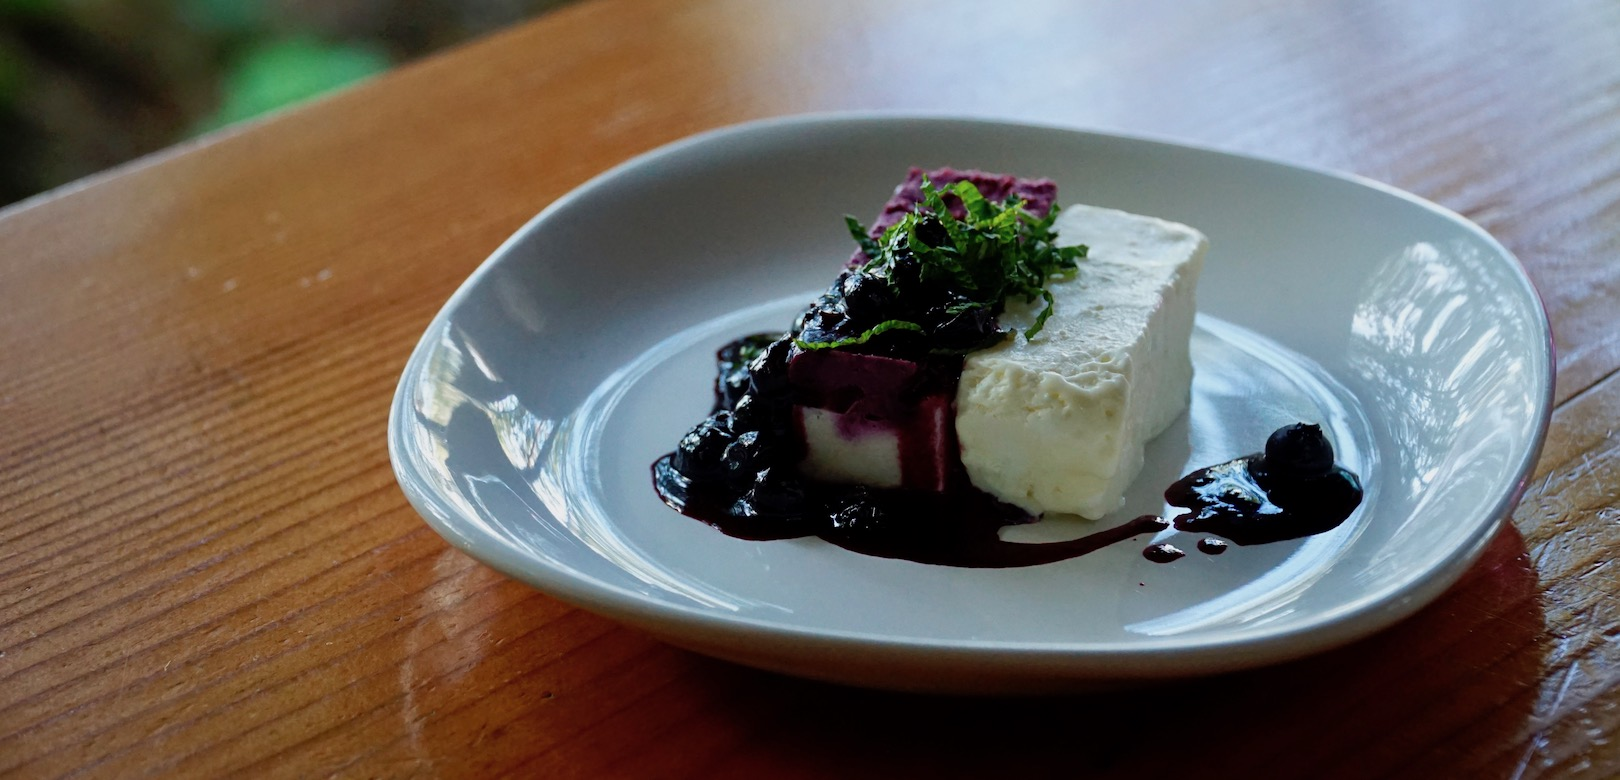 Tiramisu and Ice Cream with a blackberry sauce